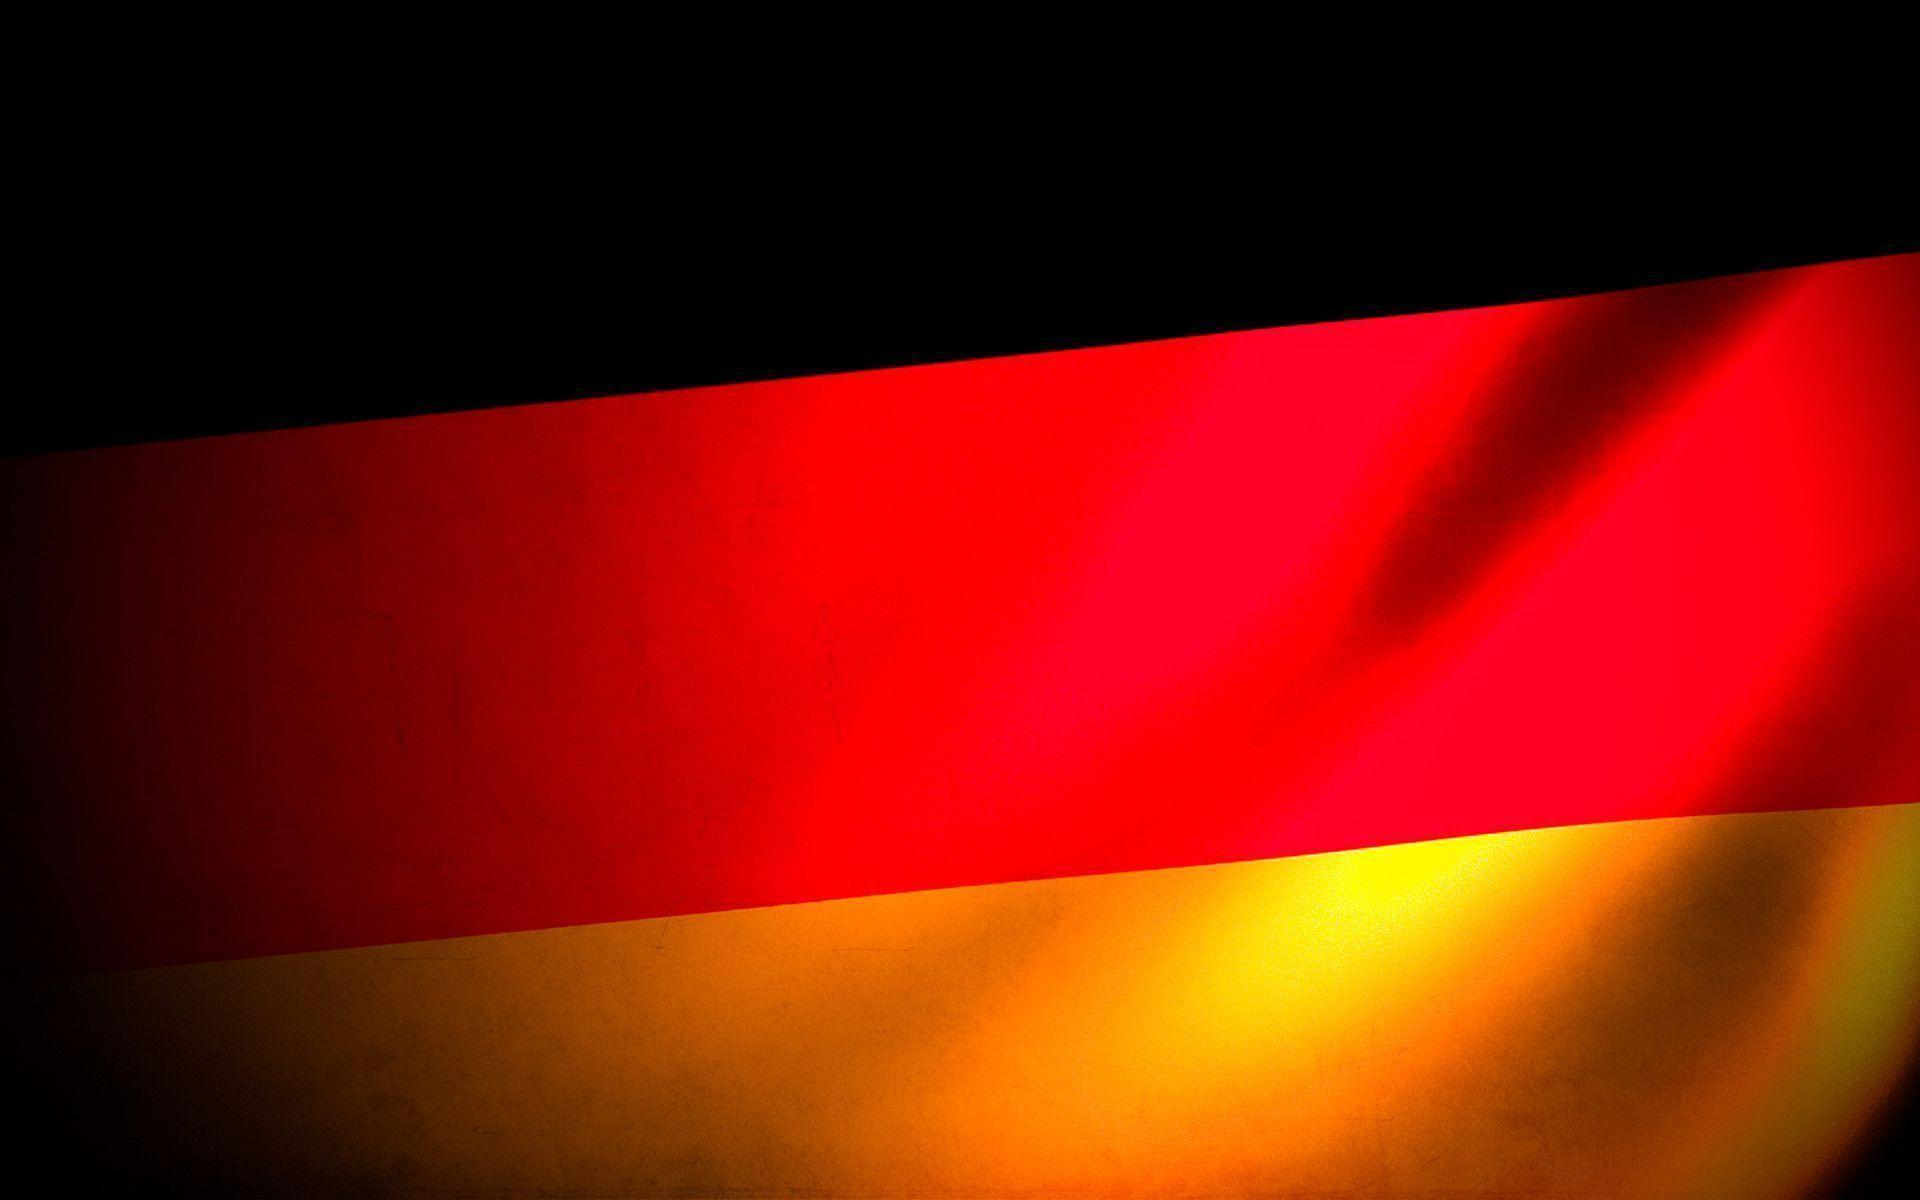 German Flag Wallpapers - Full HD wallpaper search